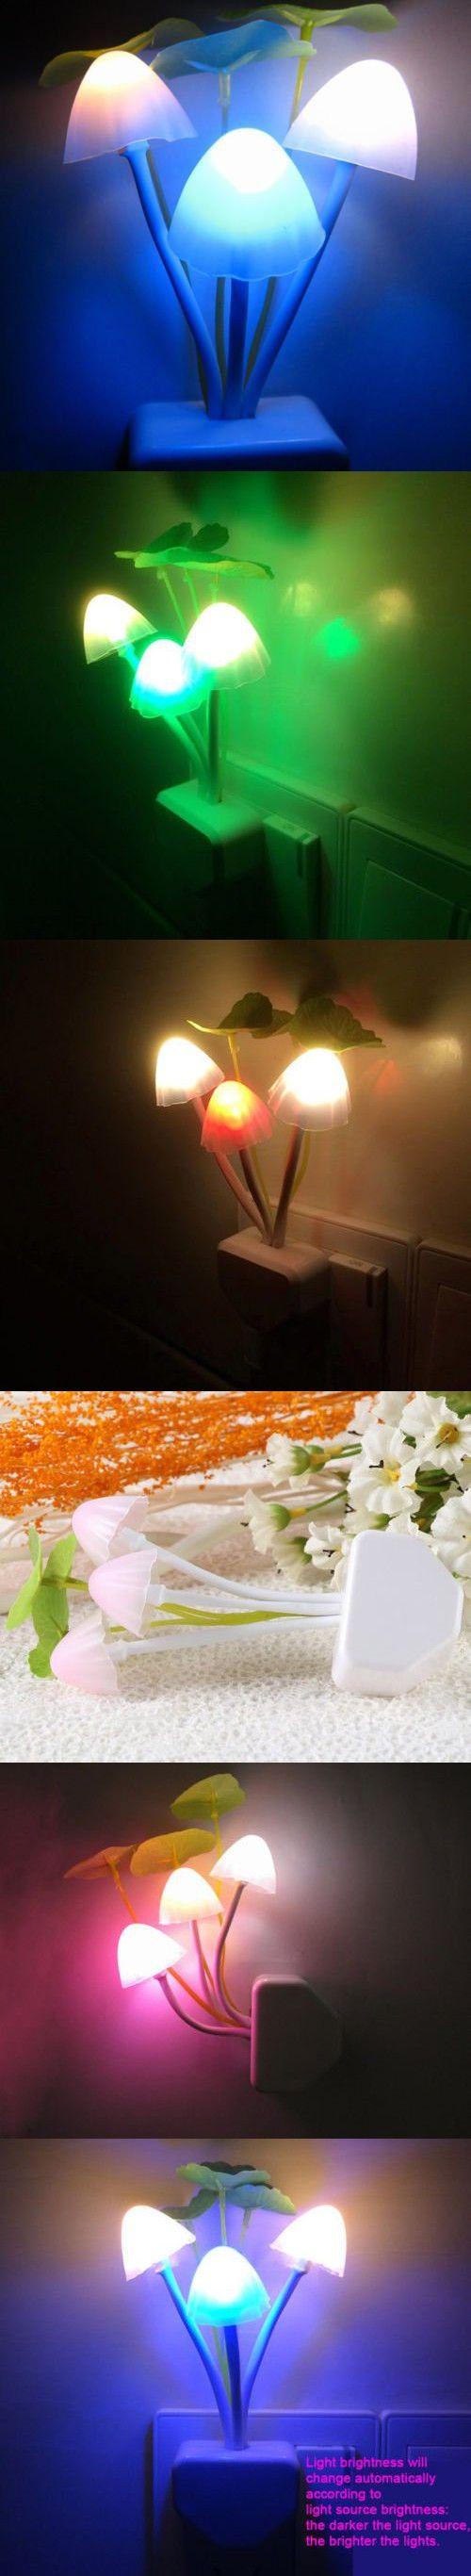 Sensor Night Light Mushroom LED Lamp EU/US Plug Romantic Colorful Home Decor